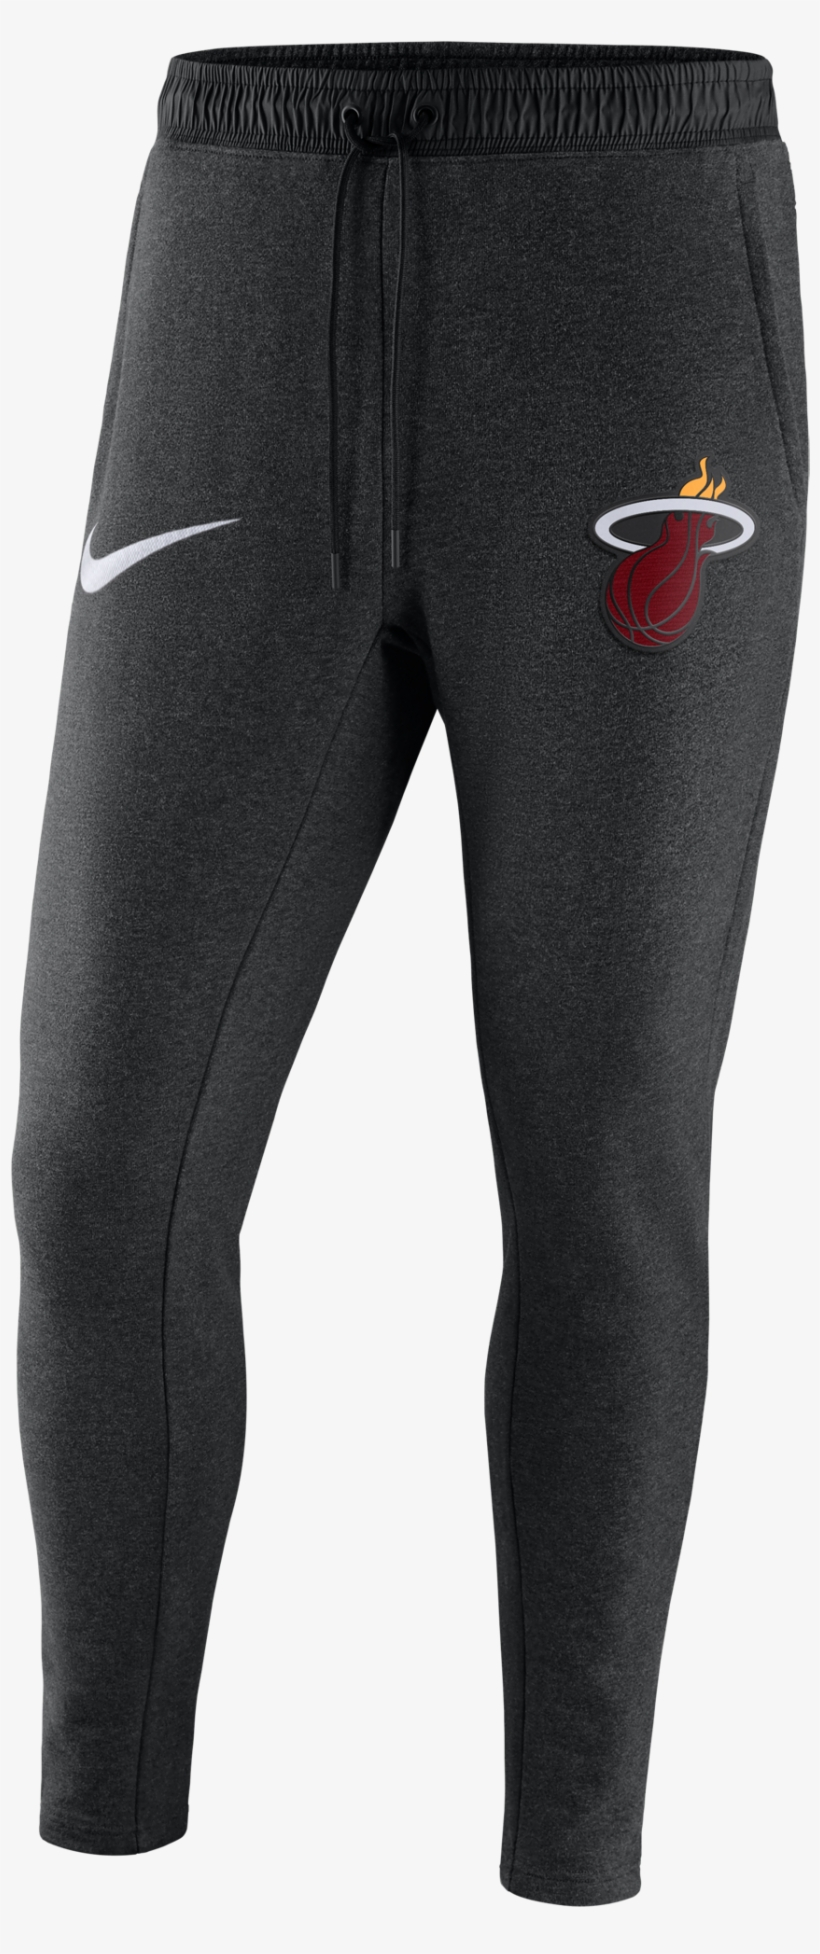 713ea4ac6d1a Nike Miami Heat Modern Pant Fz - Nike Women s Squad 17 Dry Track Pant